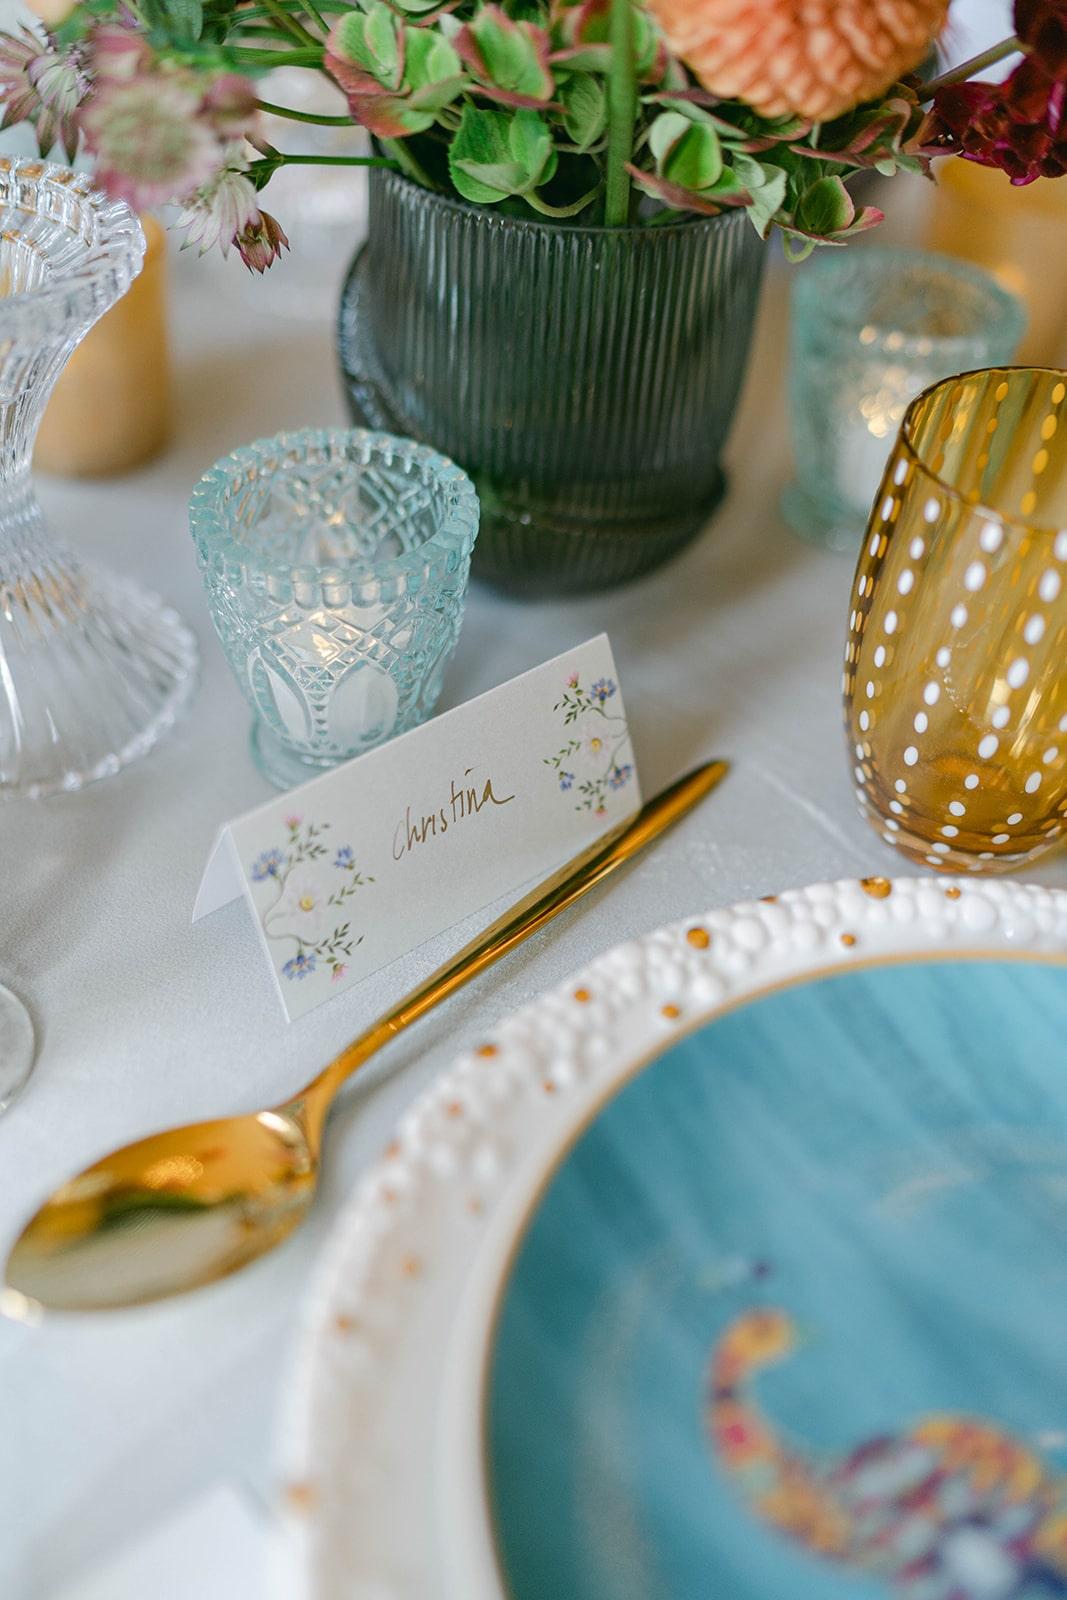 floral place card wedding table décor